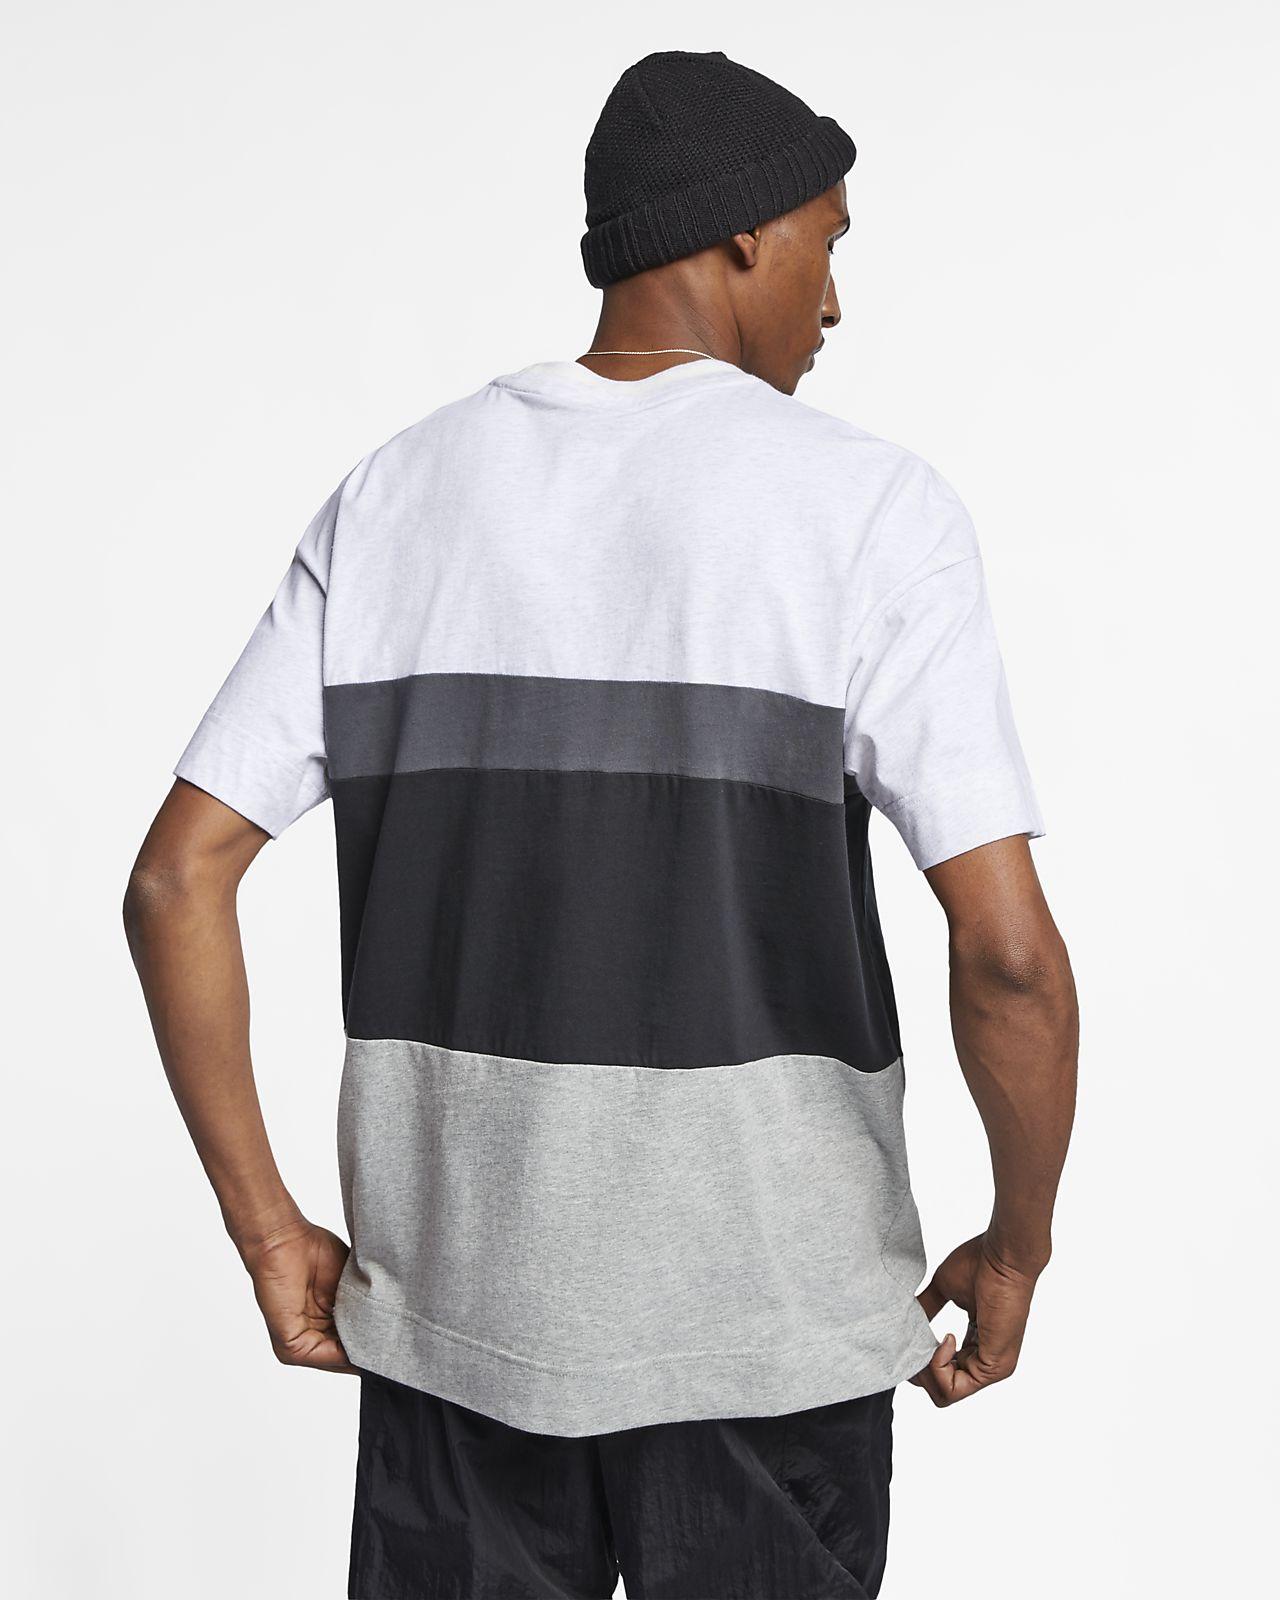 Low Resolution Ανδρική κοντομάνικη μπλούζα Nike Air Ανδρική κοντομάνικη  μπλούζα Nike Air a96c78bed5a